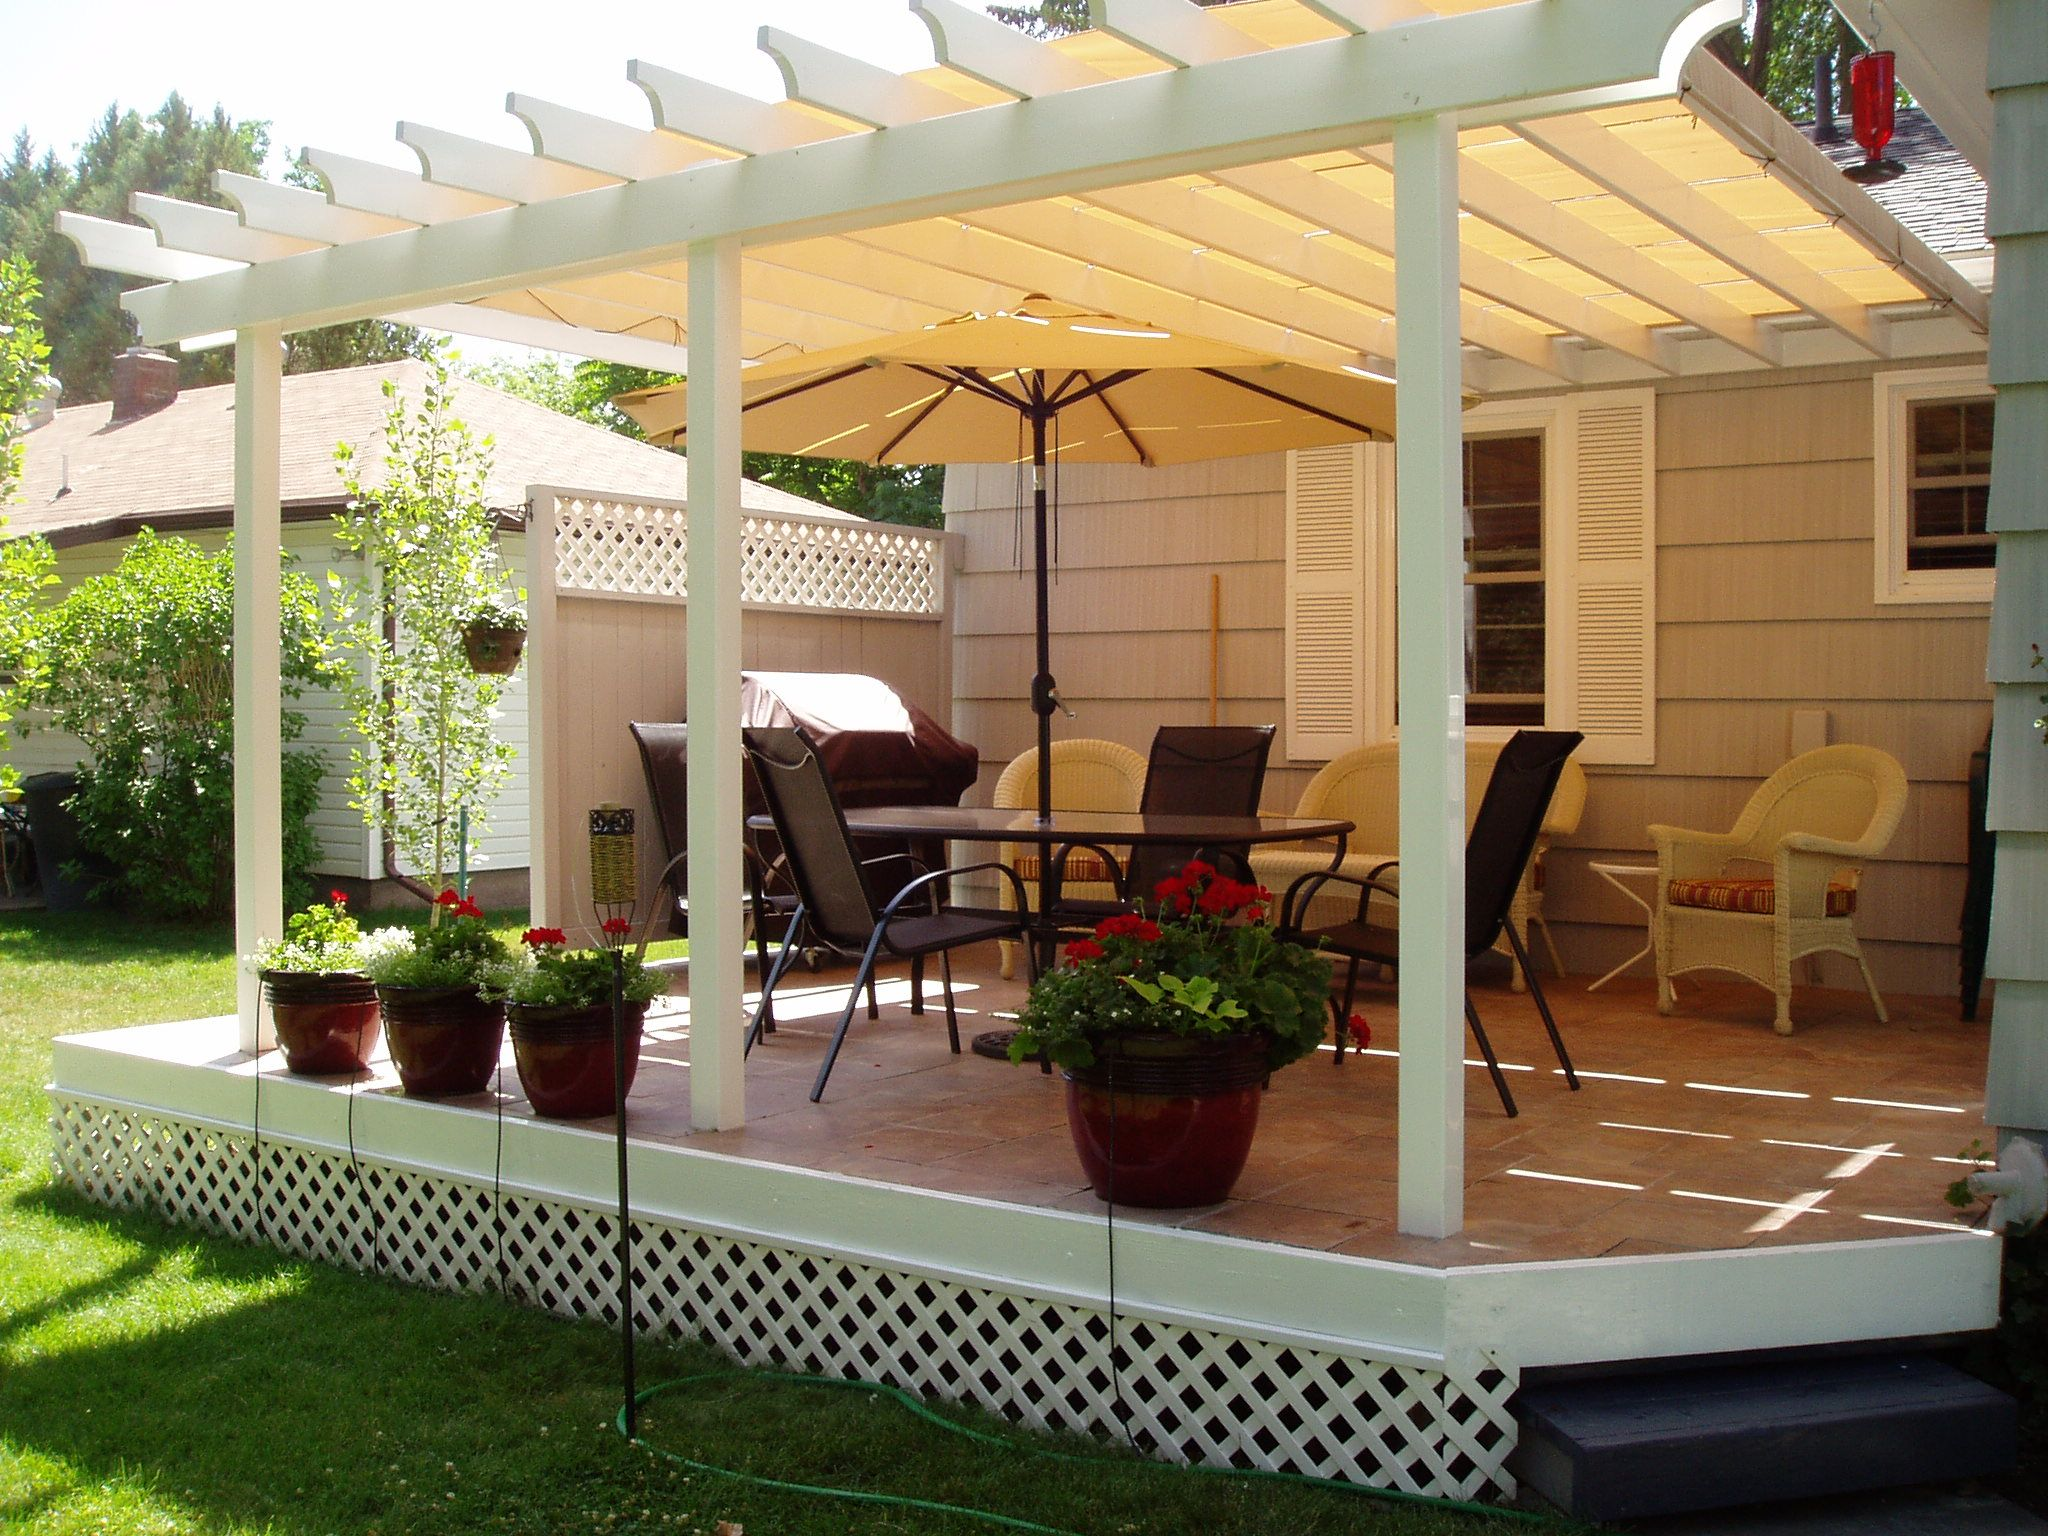 pergolas/canopies | Sams Club Montego Bay Pergola ...